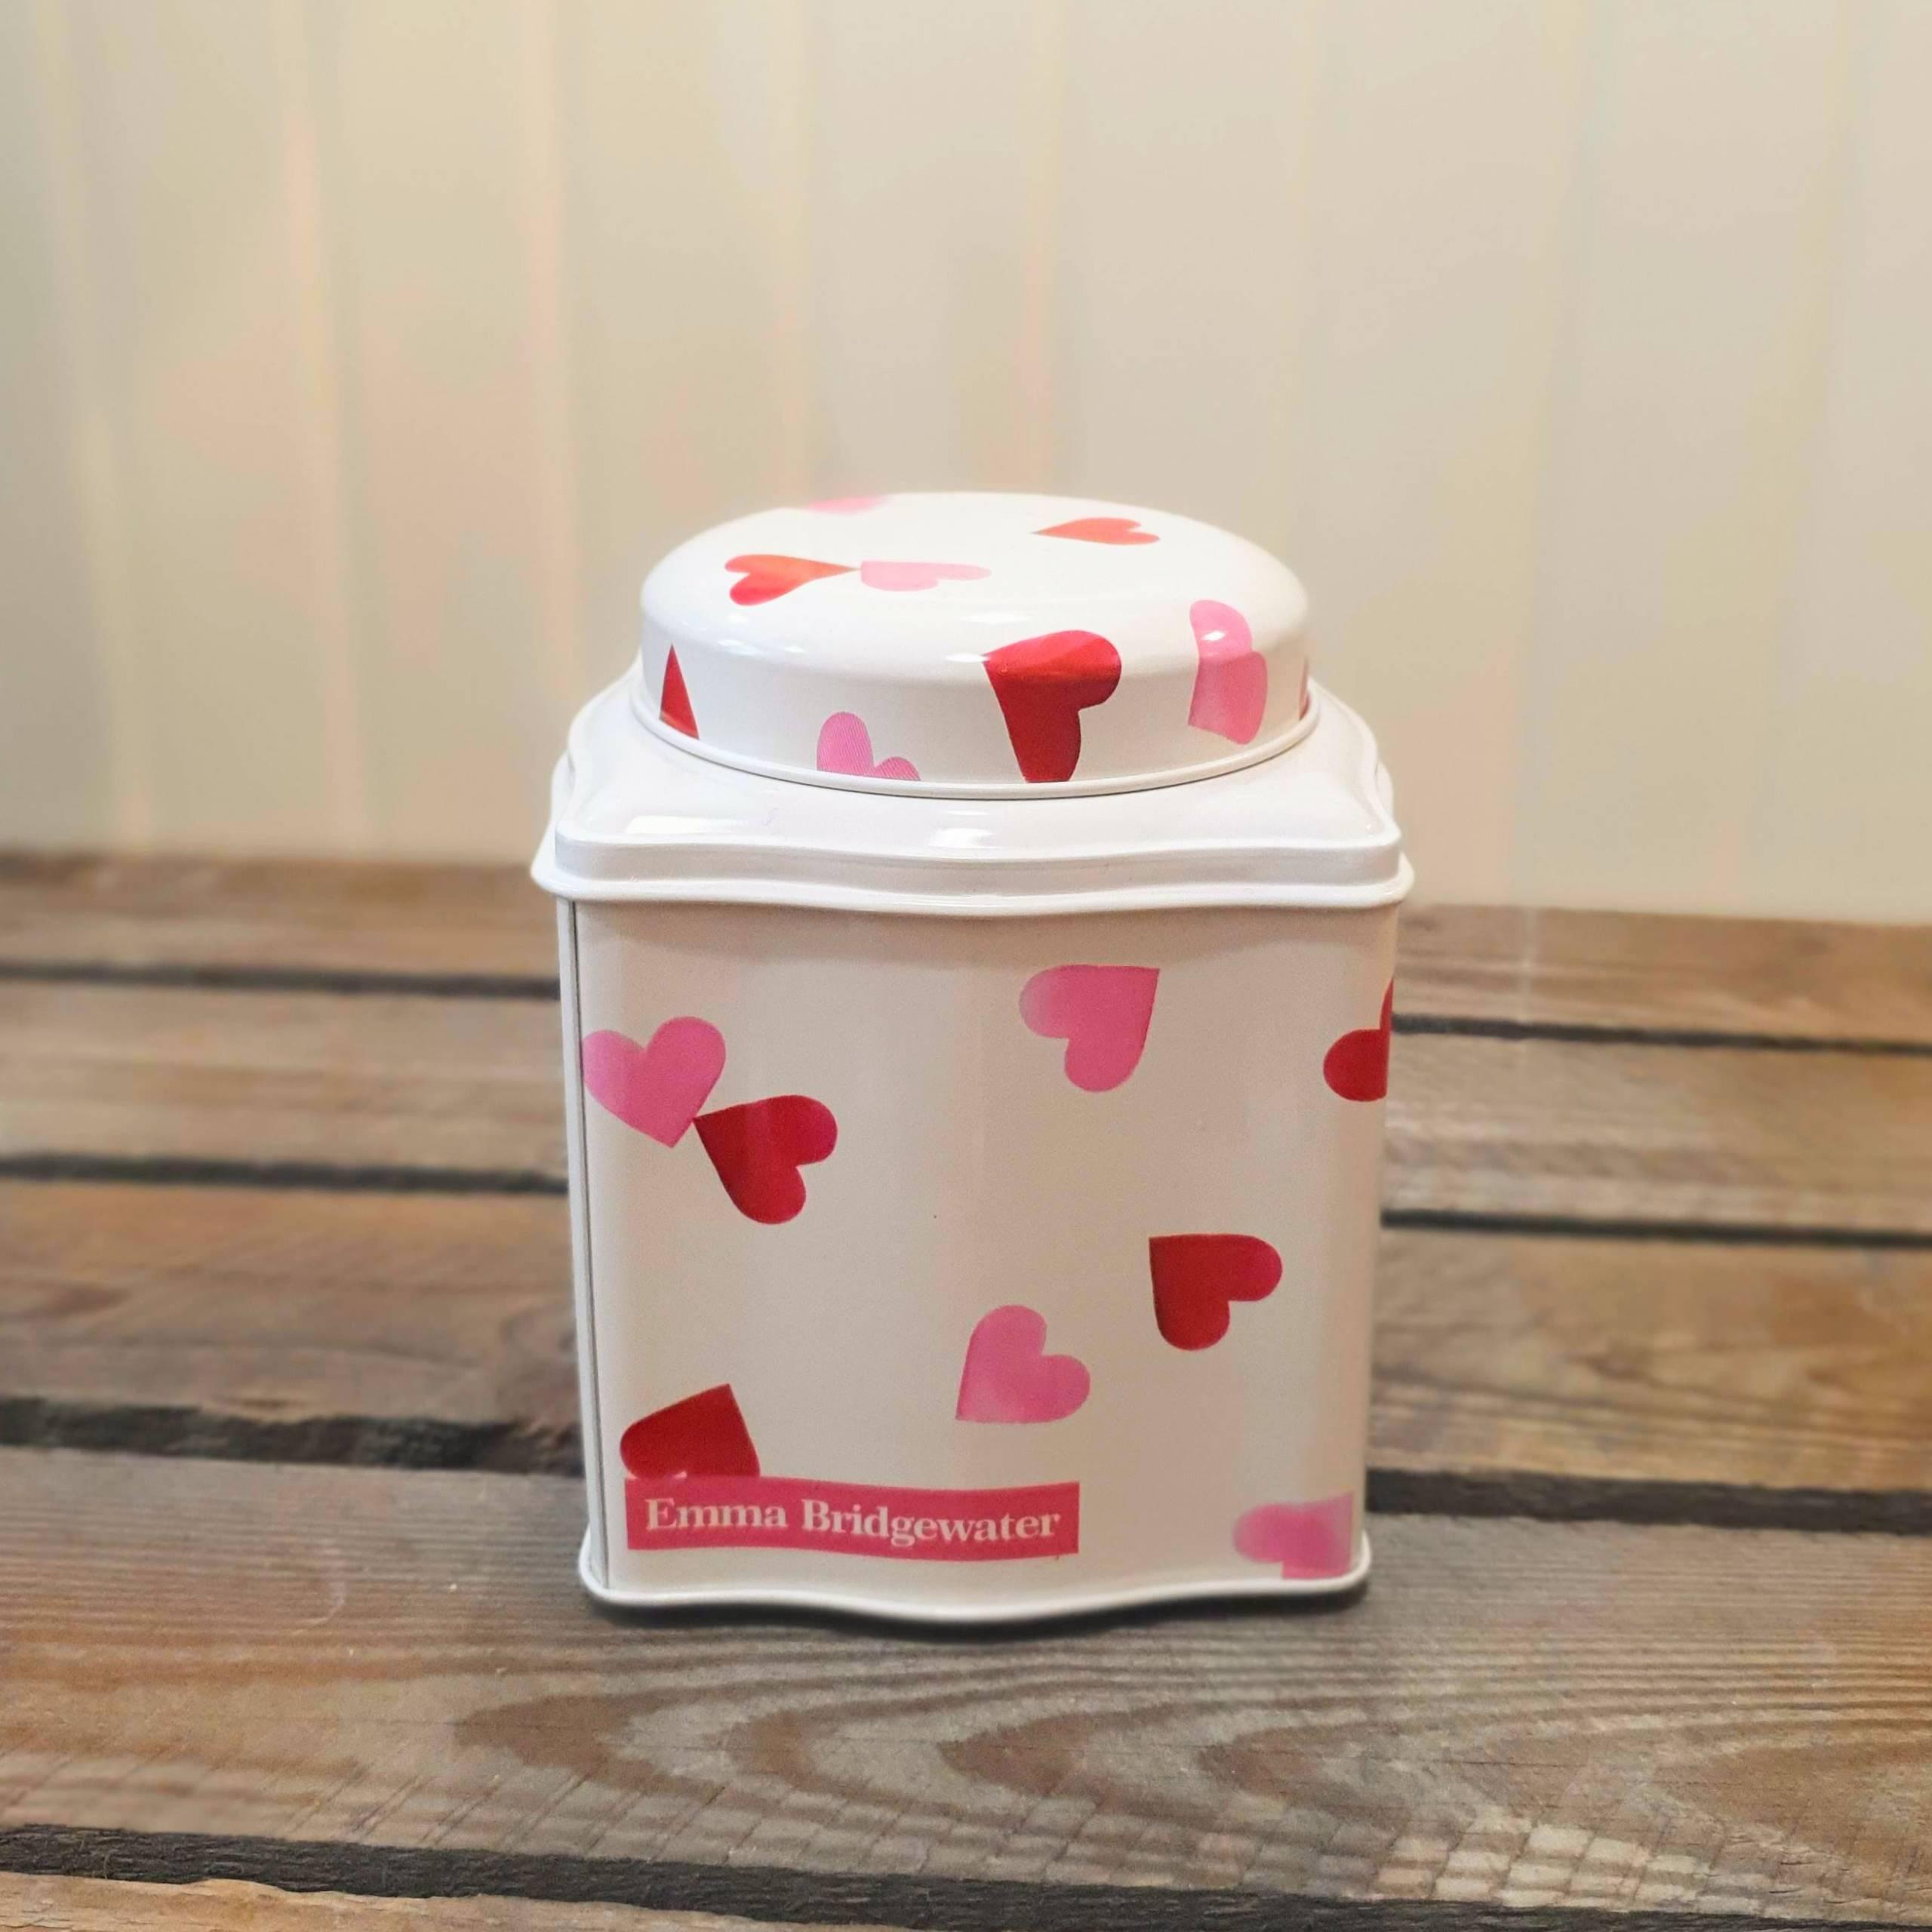 emma bridgewater pink hearts tin